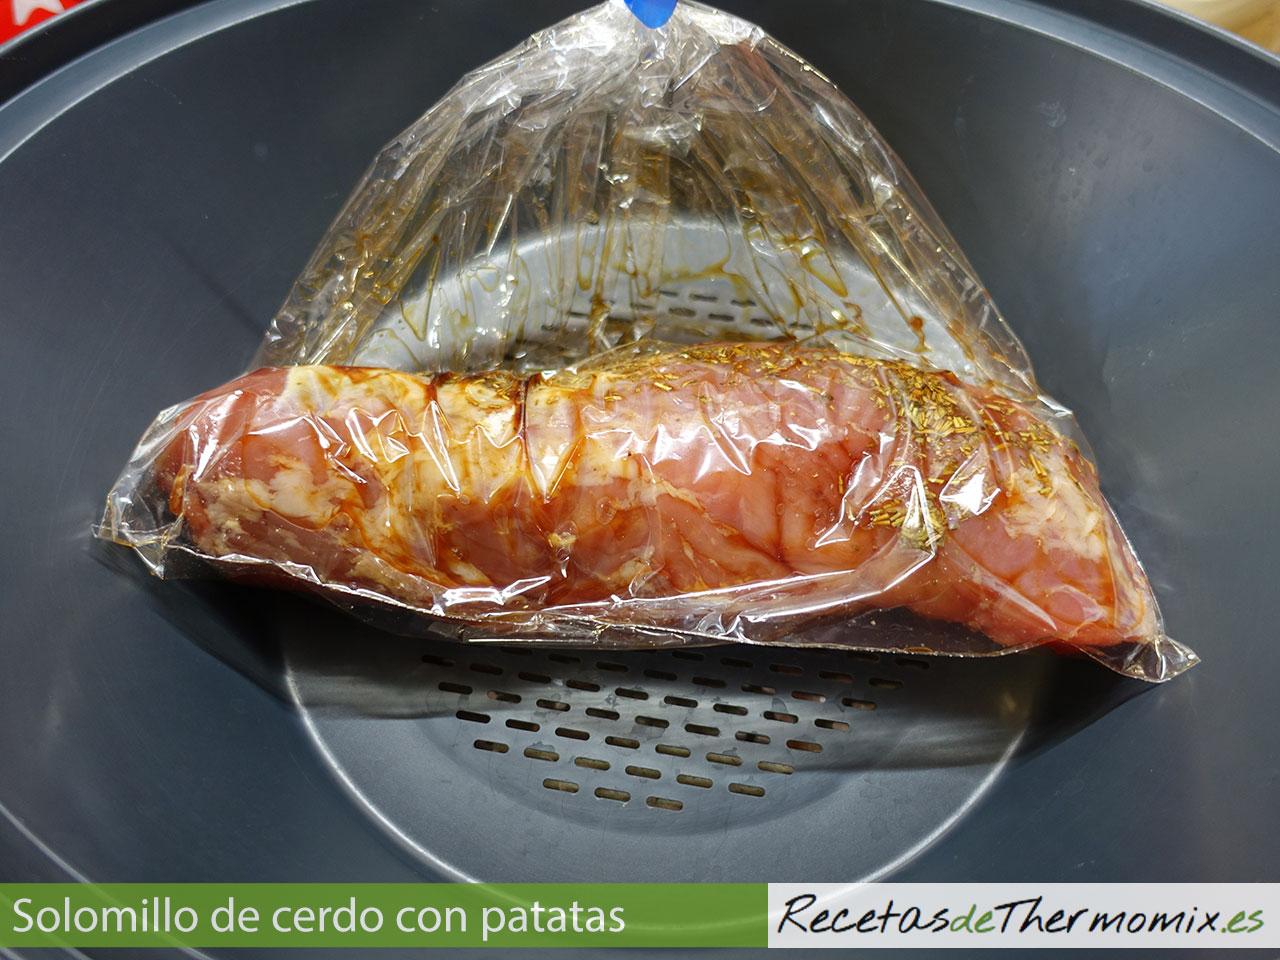 Solomillo de cerdo al vapor con patatas en thermomix for Como preparar solomillo